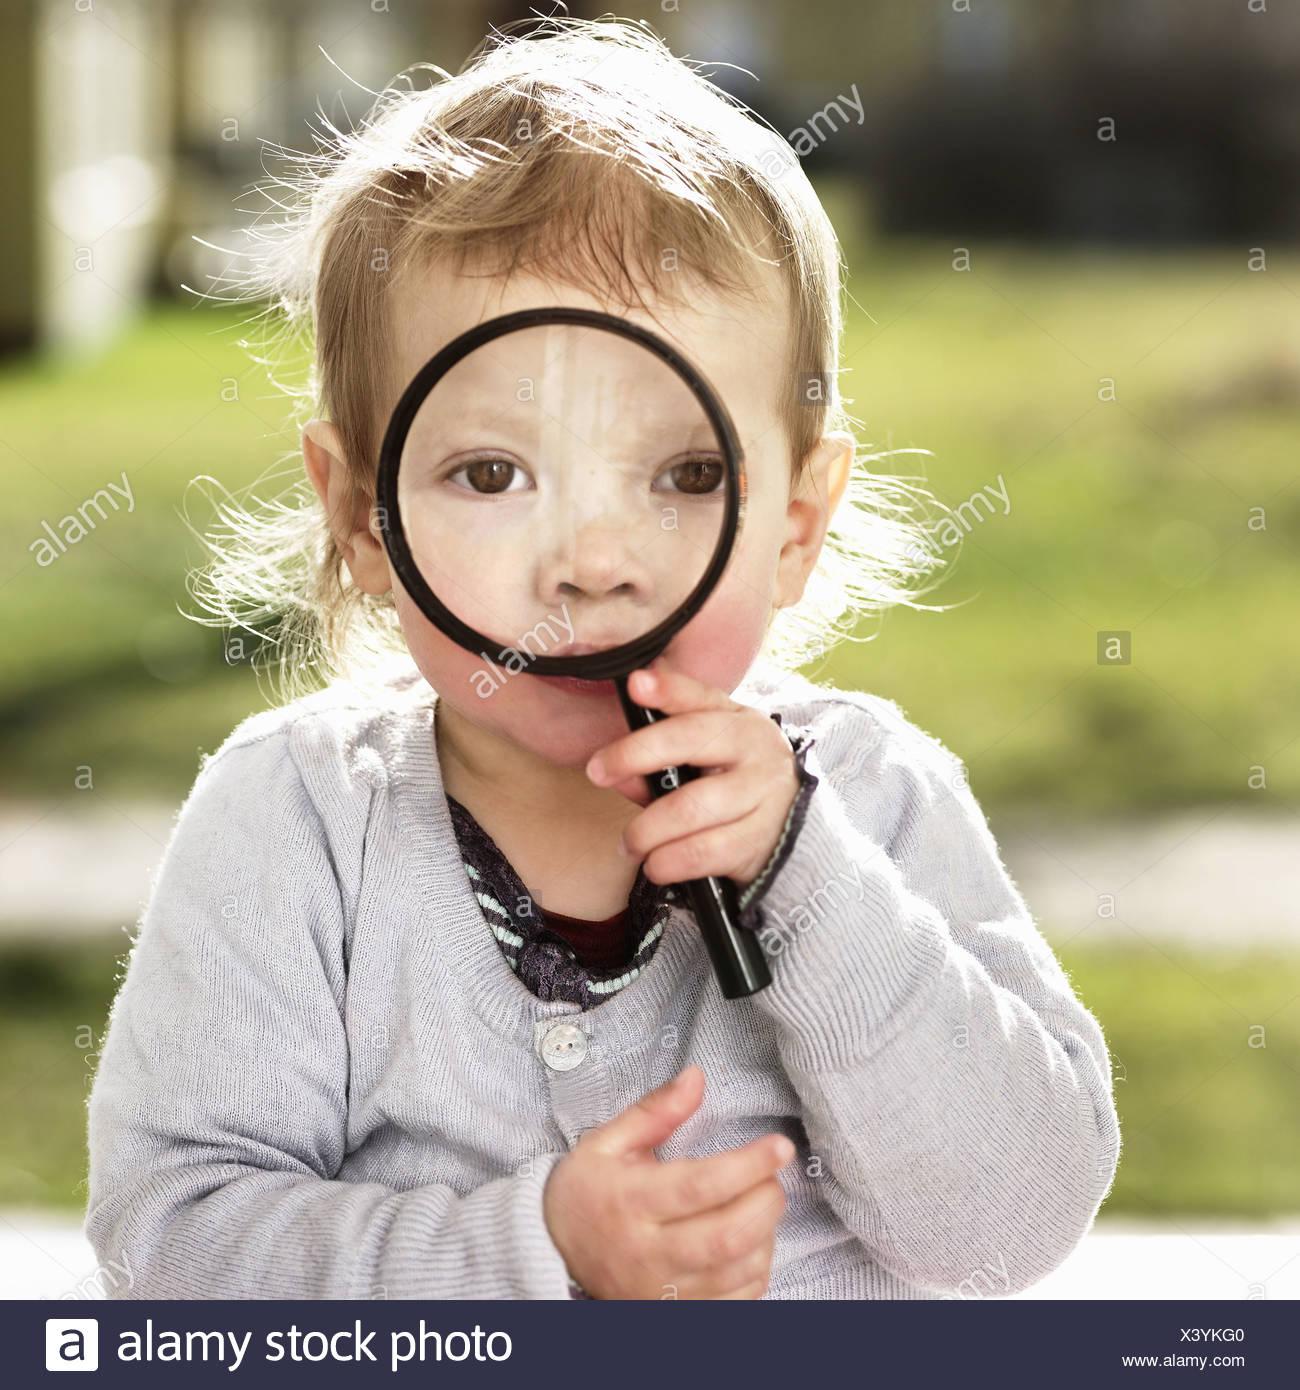 Niñito Chica sujetando la lupa Imagen De Stock